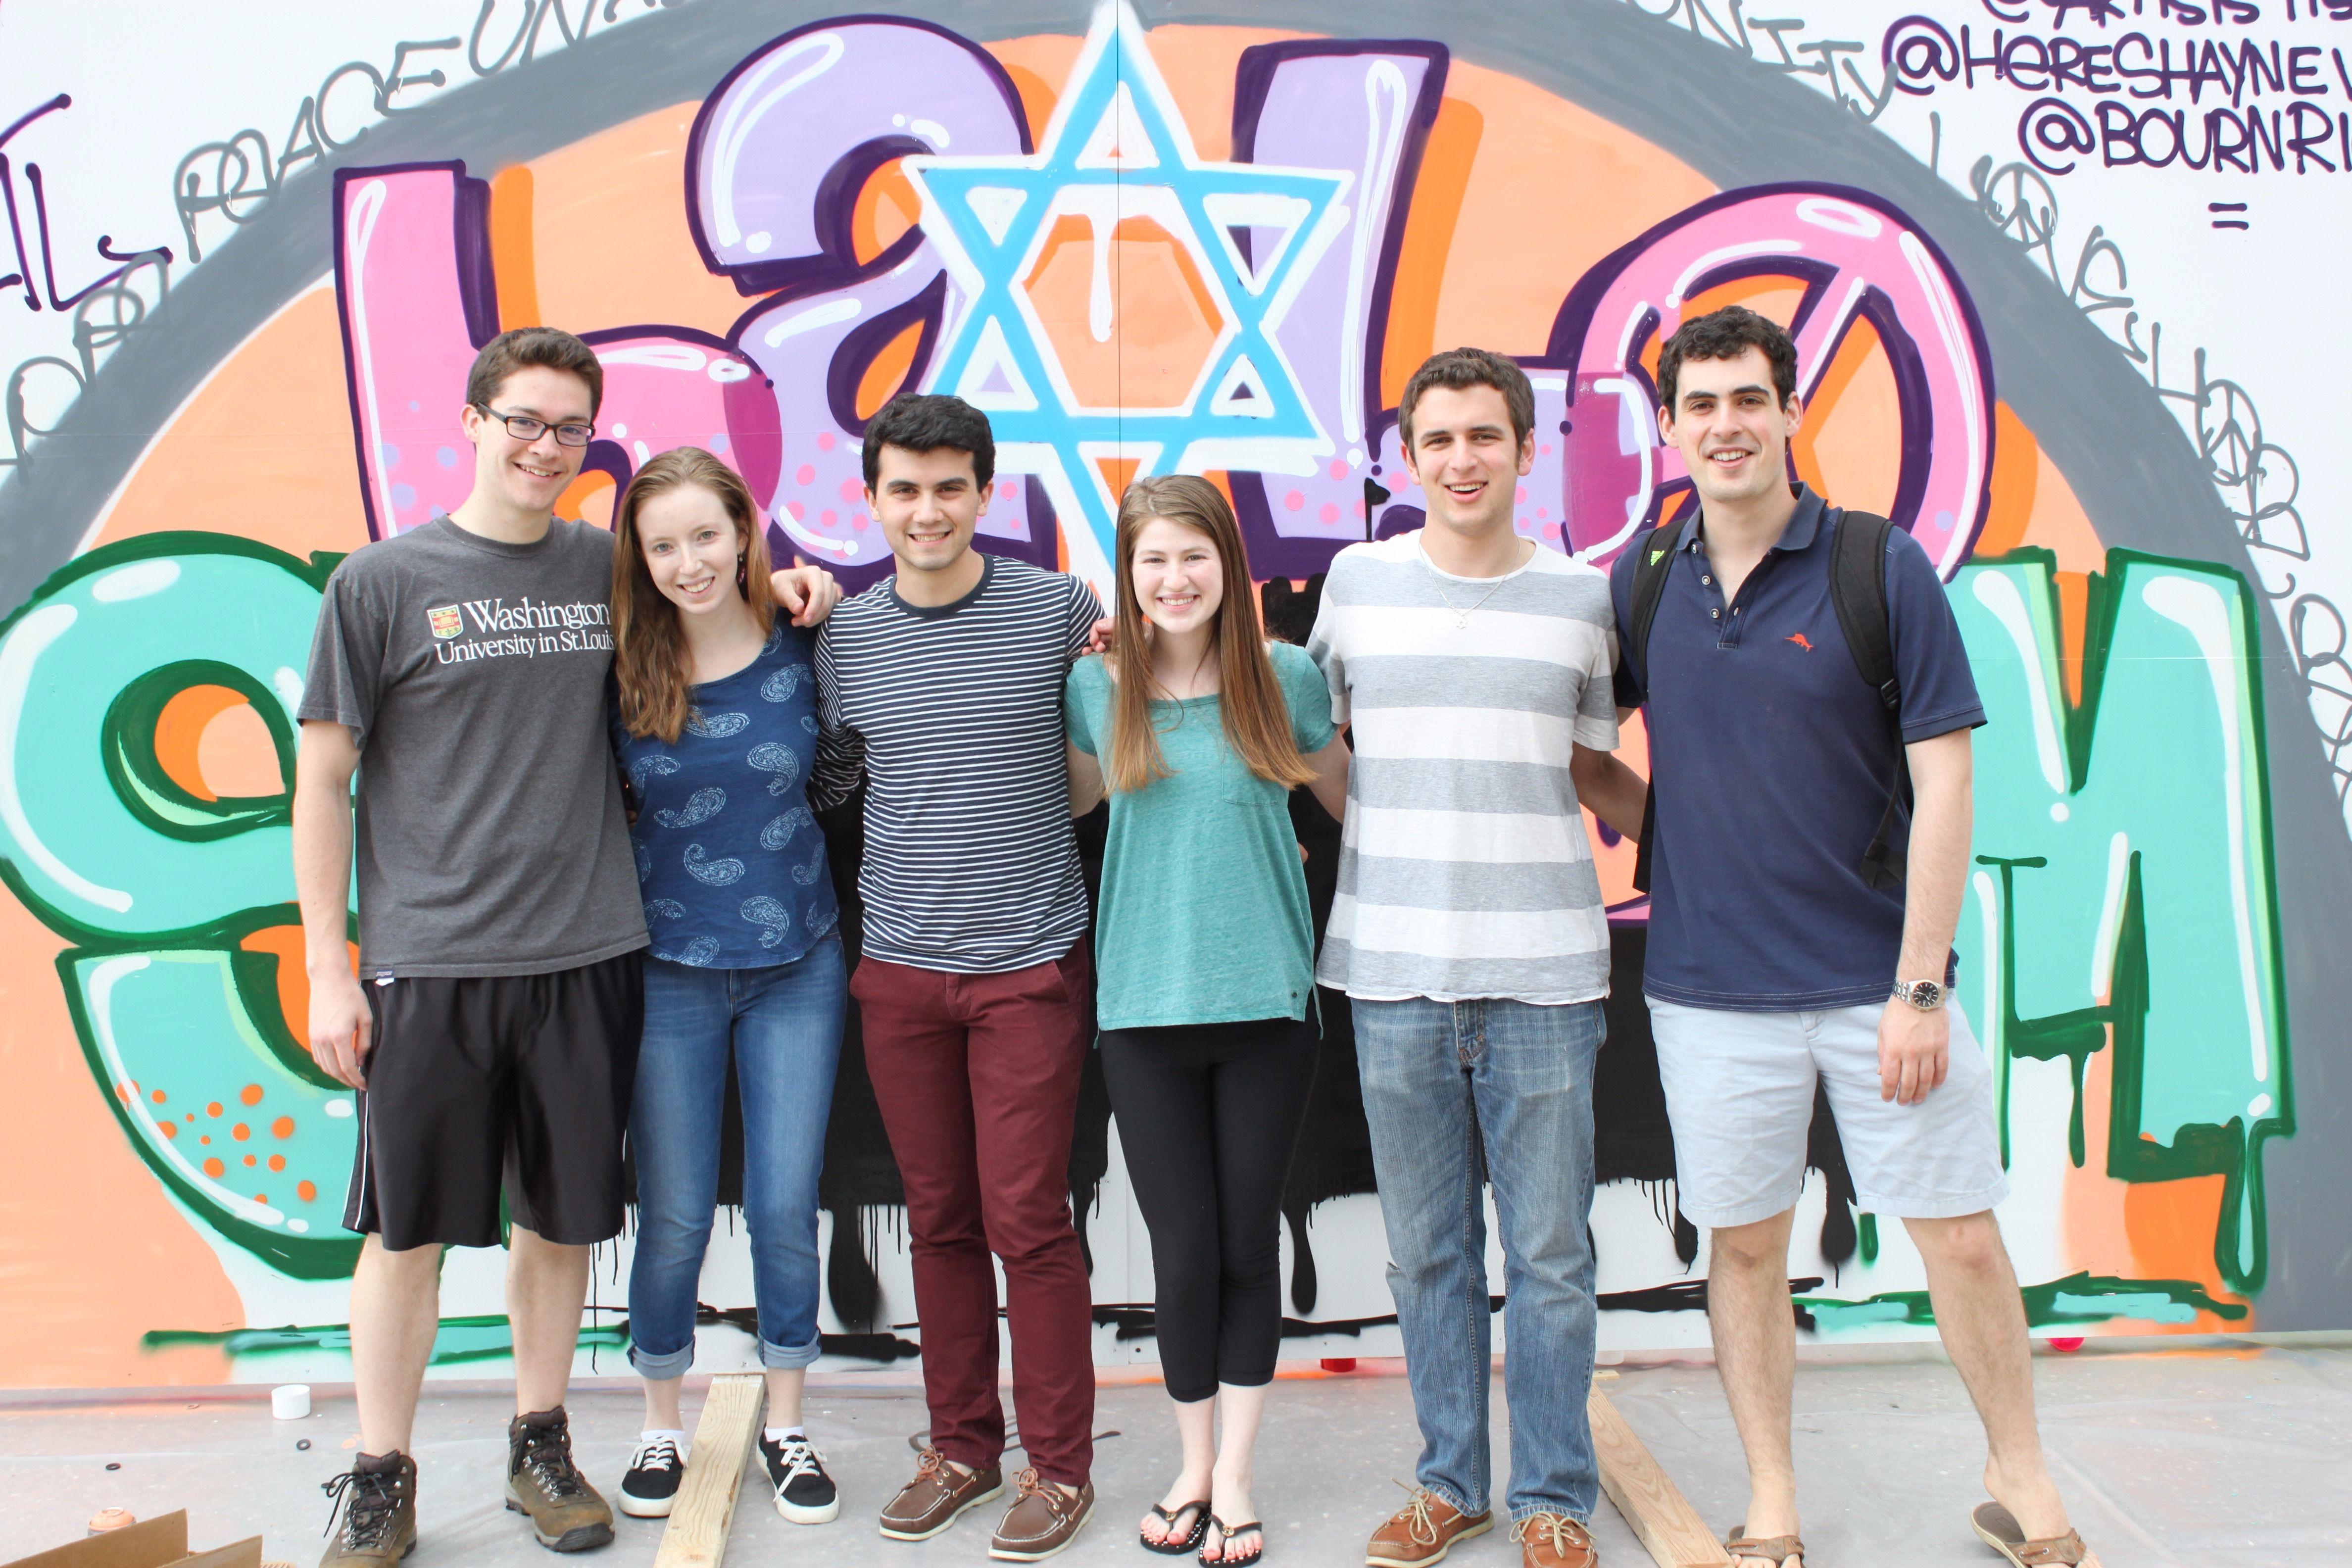 Jewish students at Washington University in St. Louis